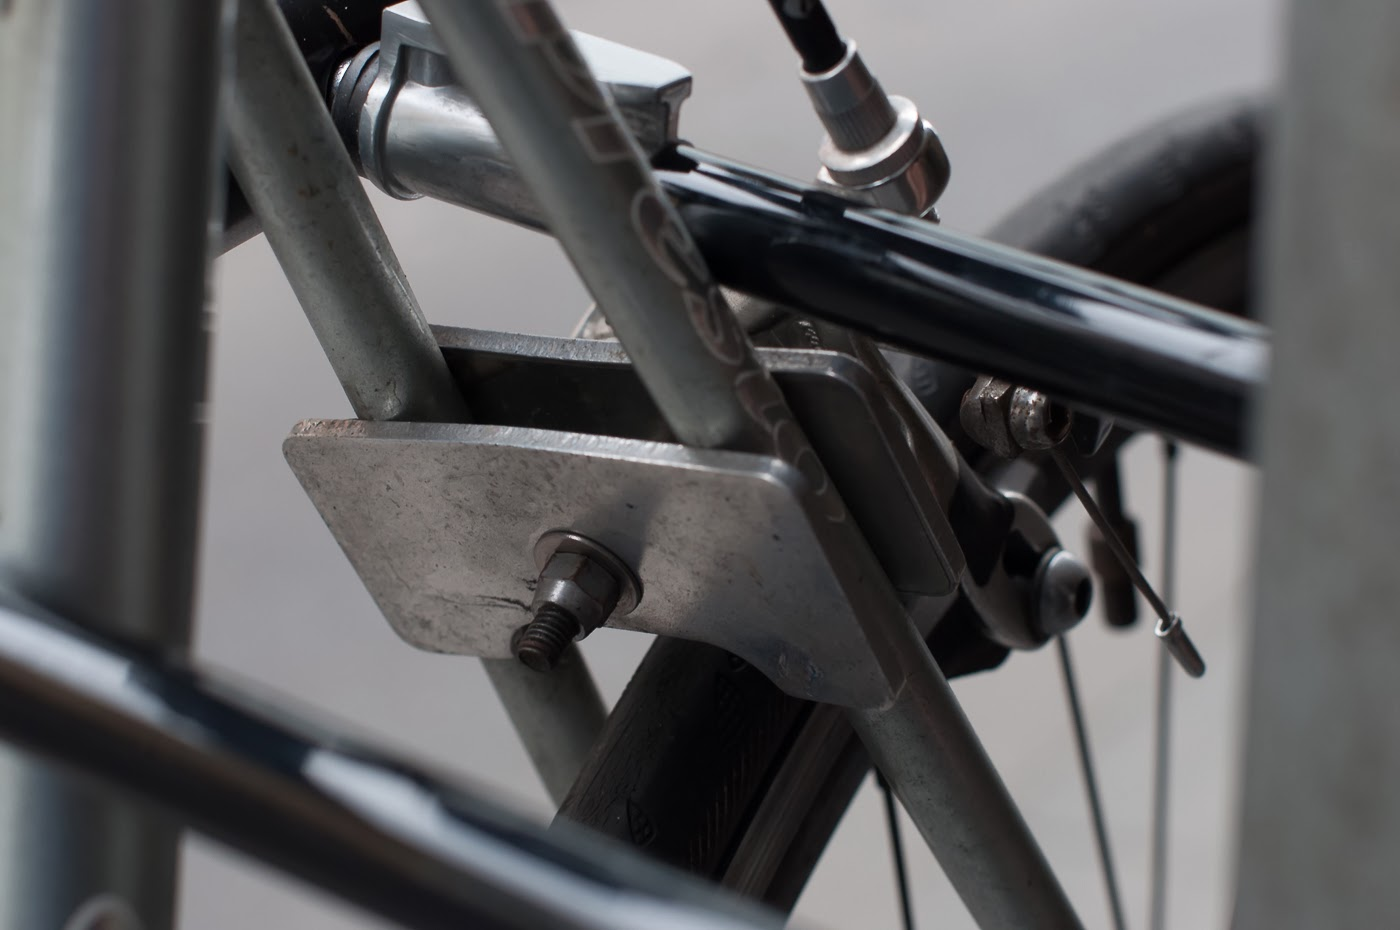 njs, single speed, bike, bicycle, tim macauley, the biketorialist, melbourne, track frame, conversion, presto, brake mount, custom